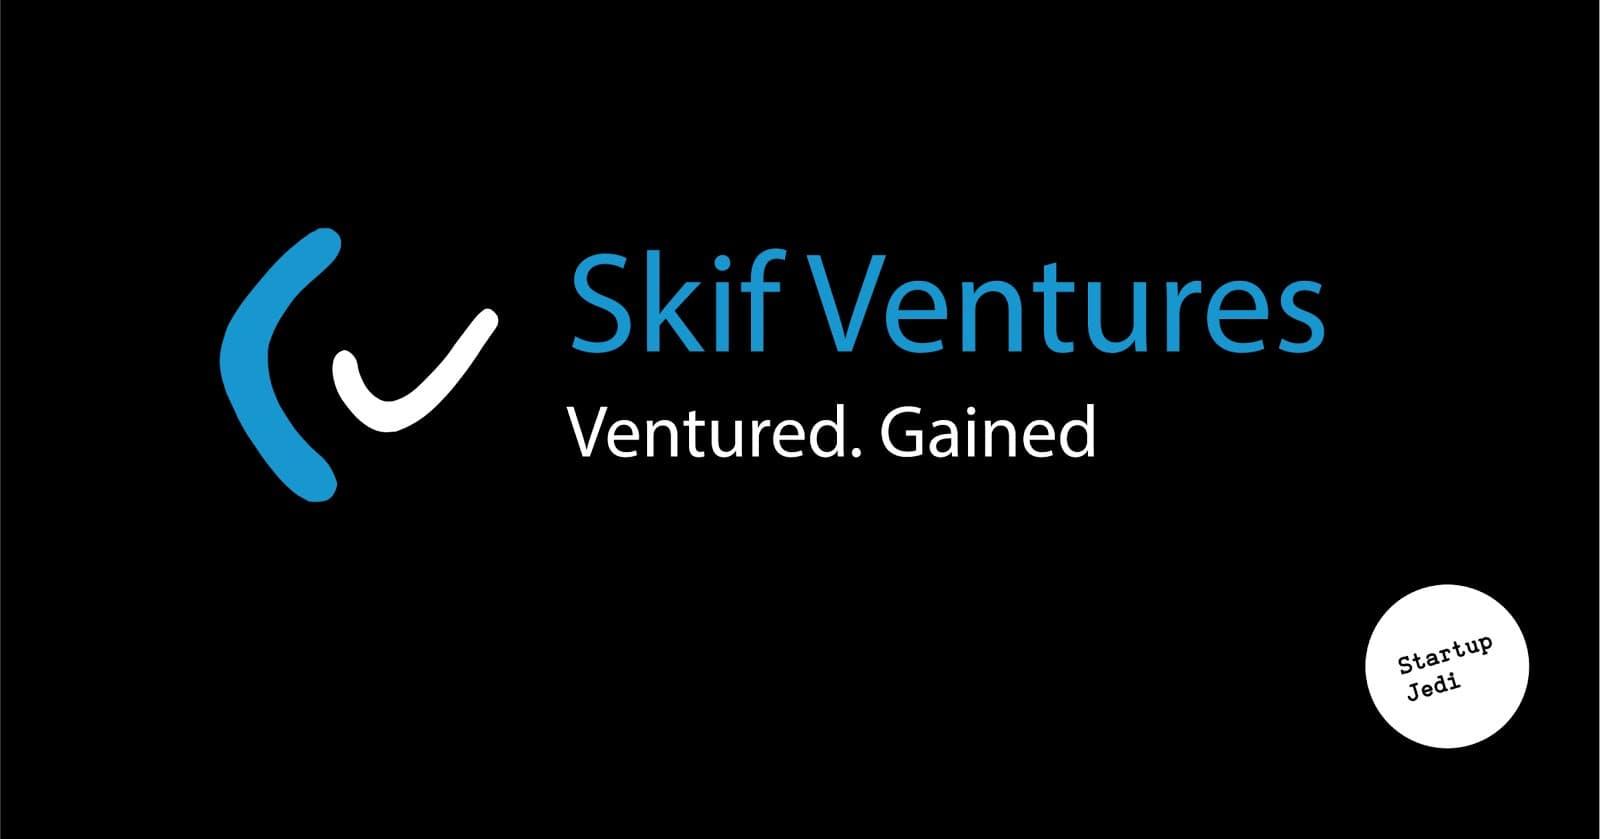 Skif Ventures